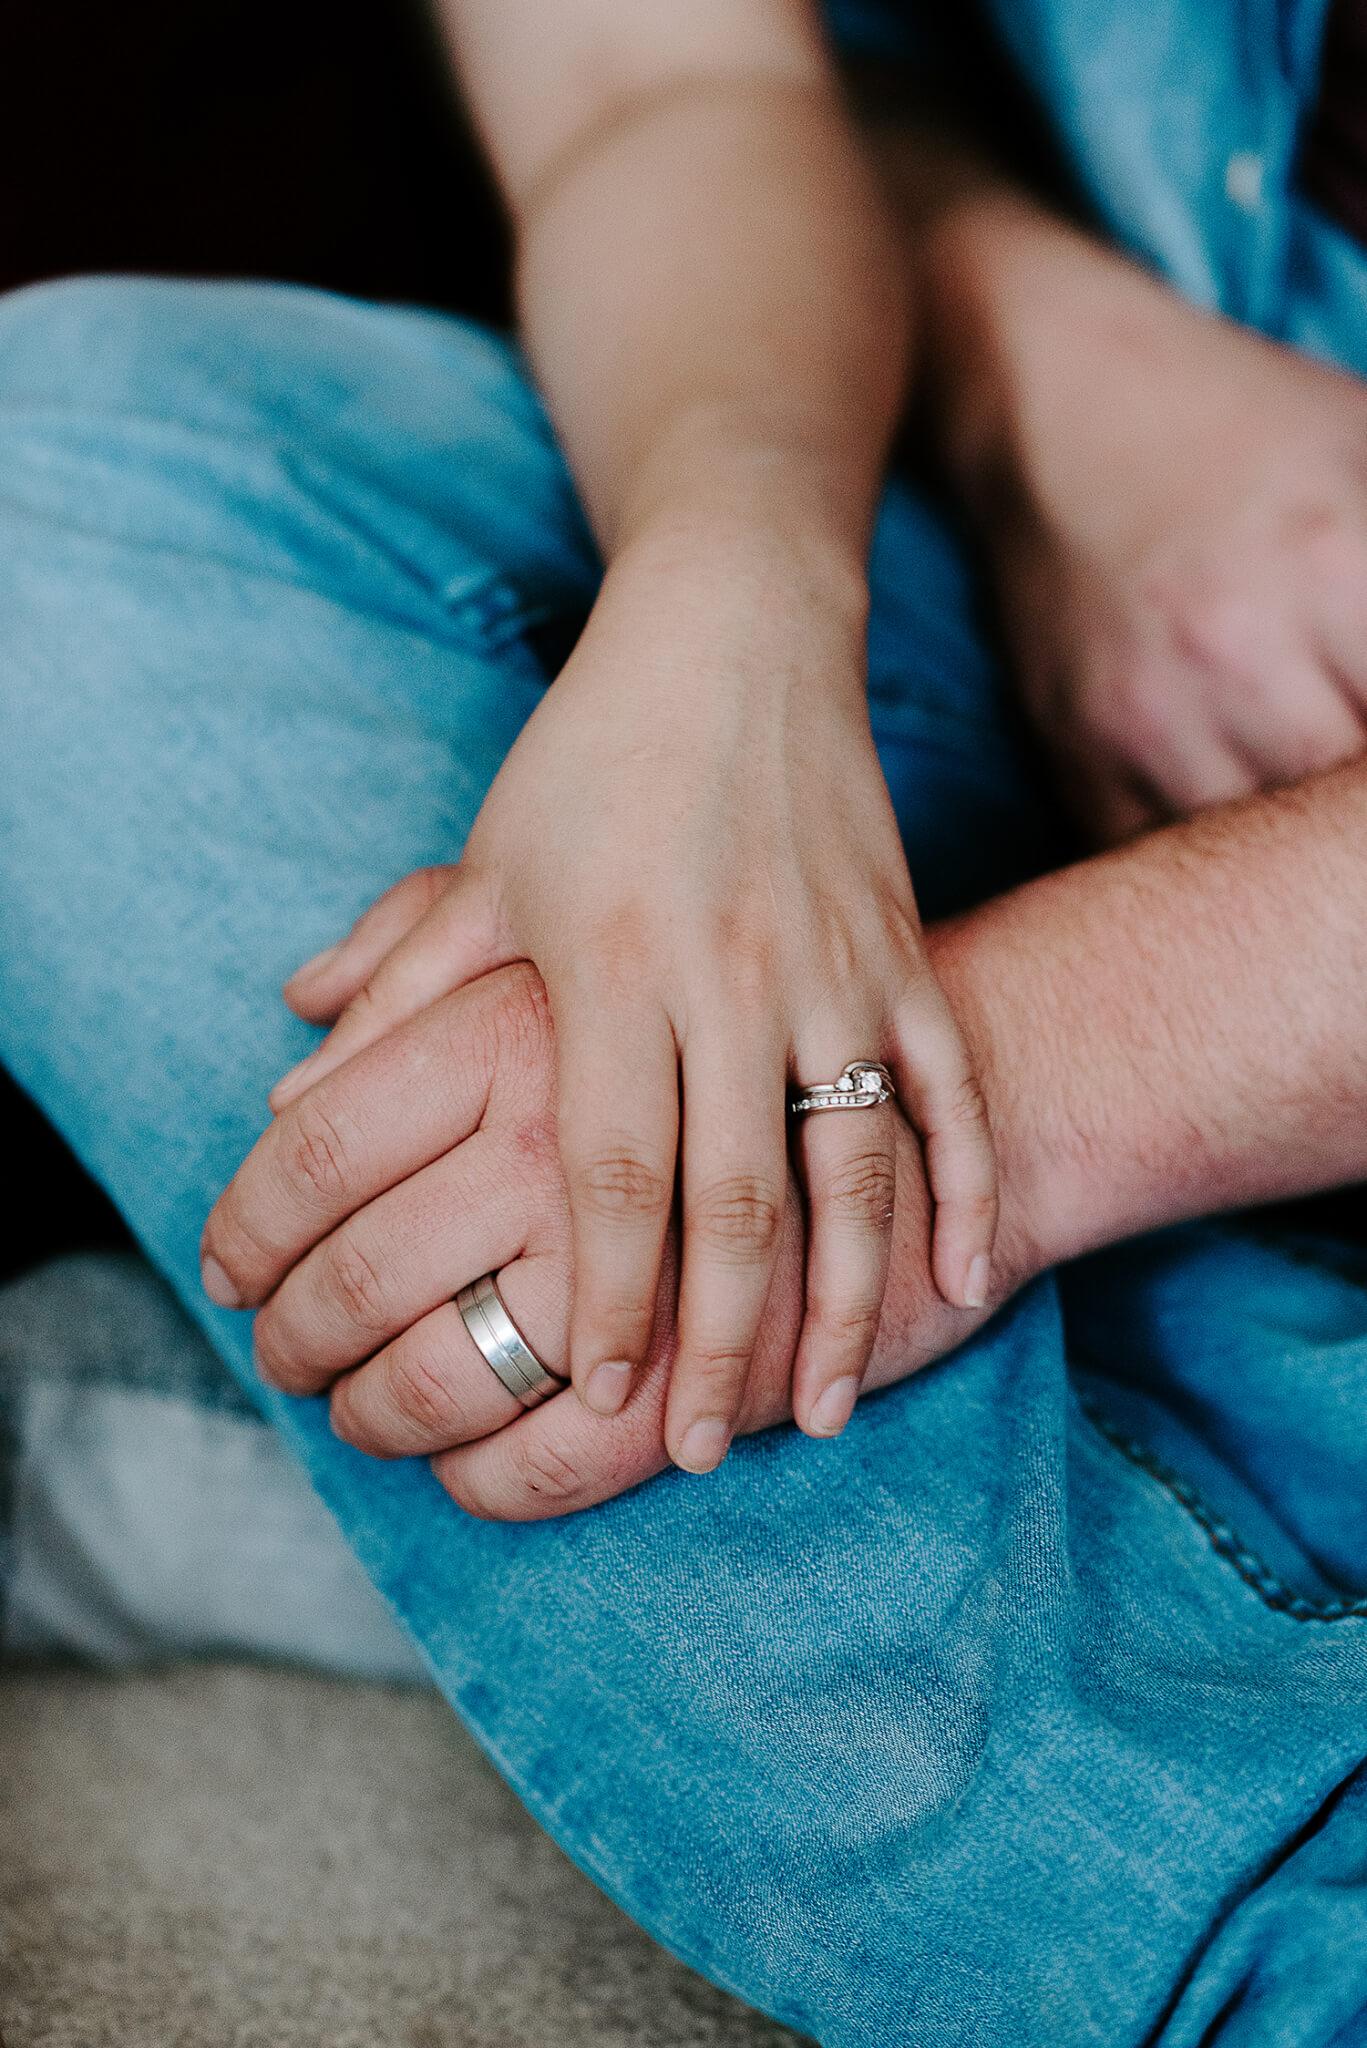 Mike Brown Linda Hoang Unexplained Infertility Pregnancy Edmonton